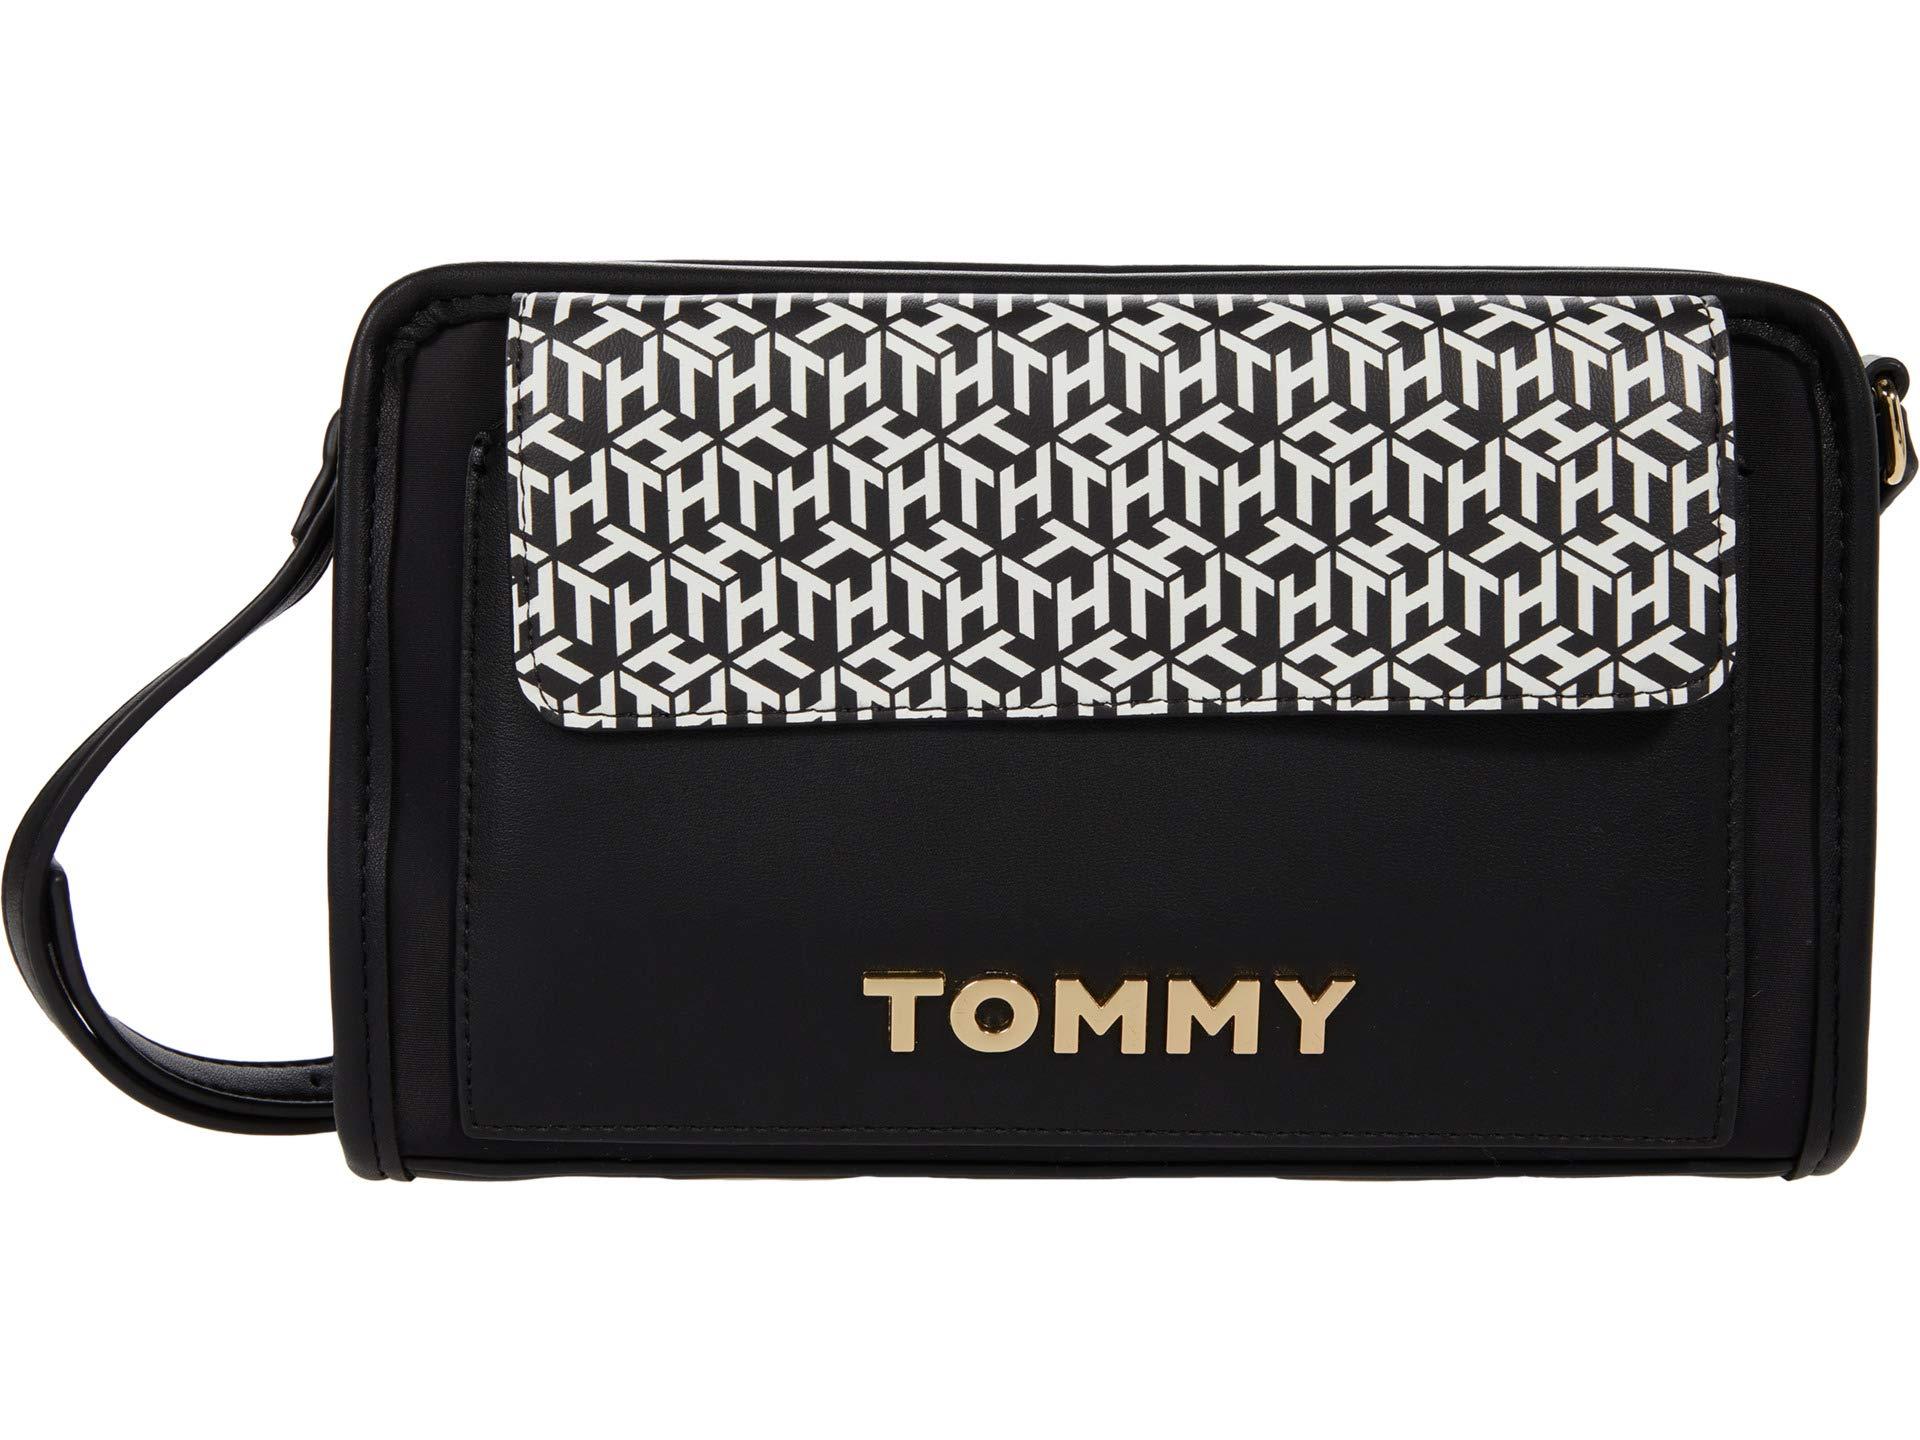 Tommy Hilfiger Tommy Hilfiger Joan Crossbody - Solid Nylon